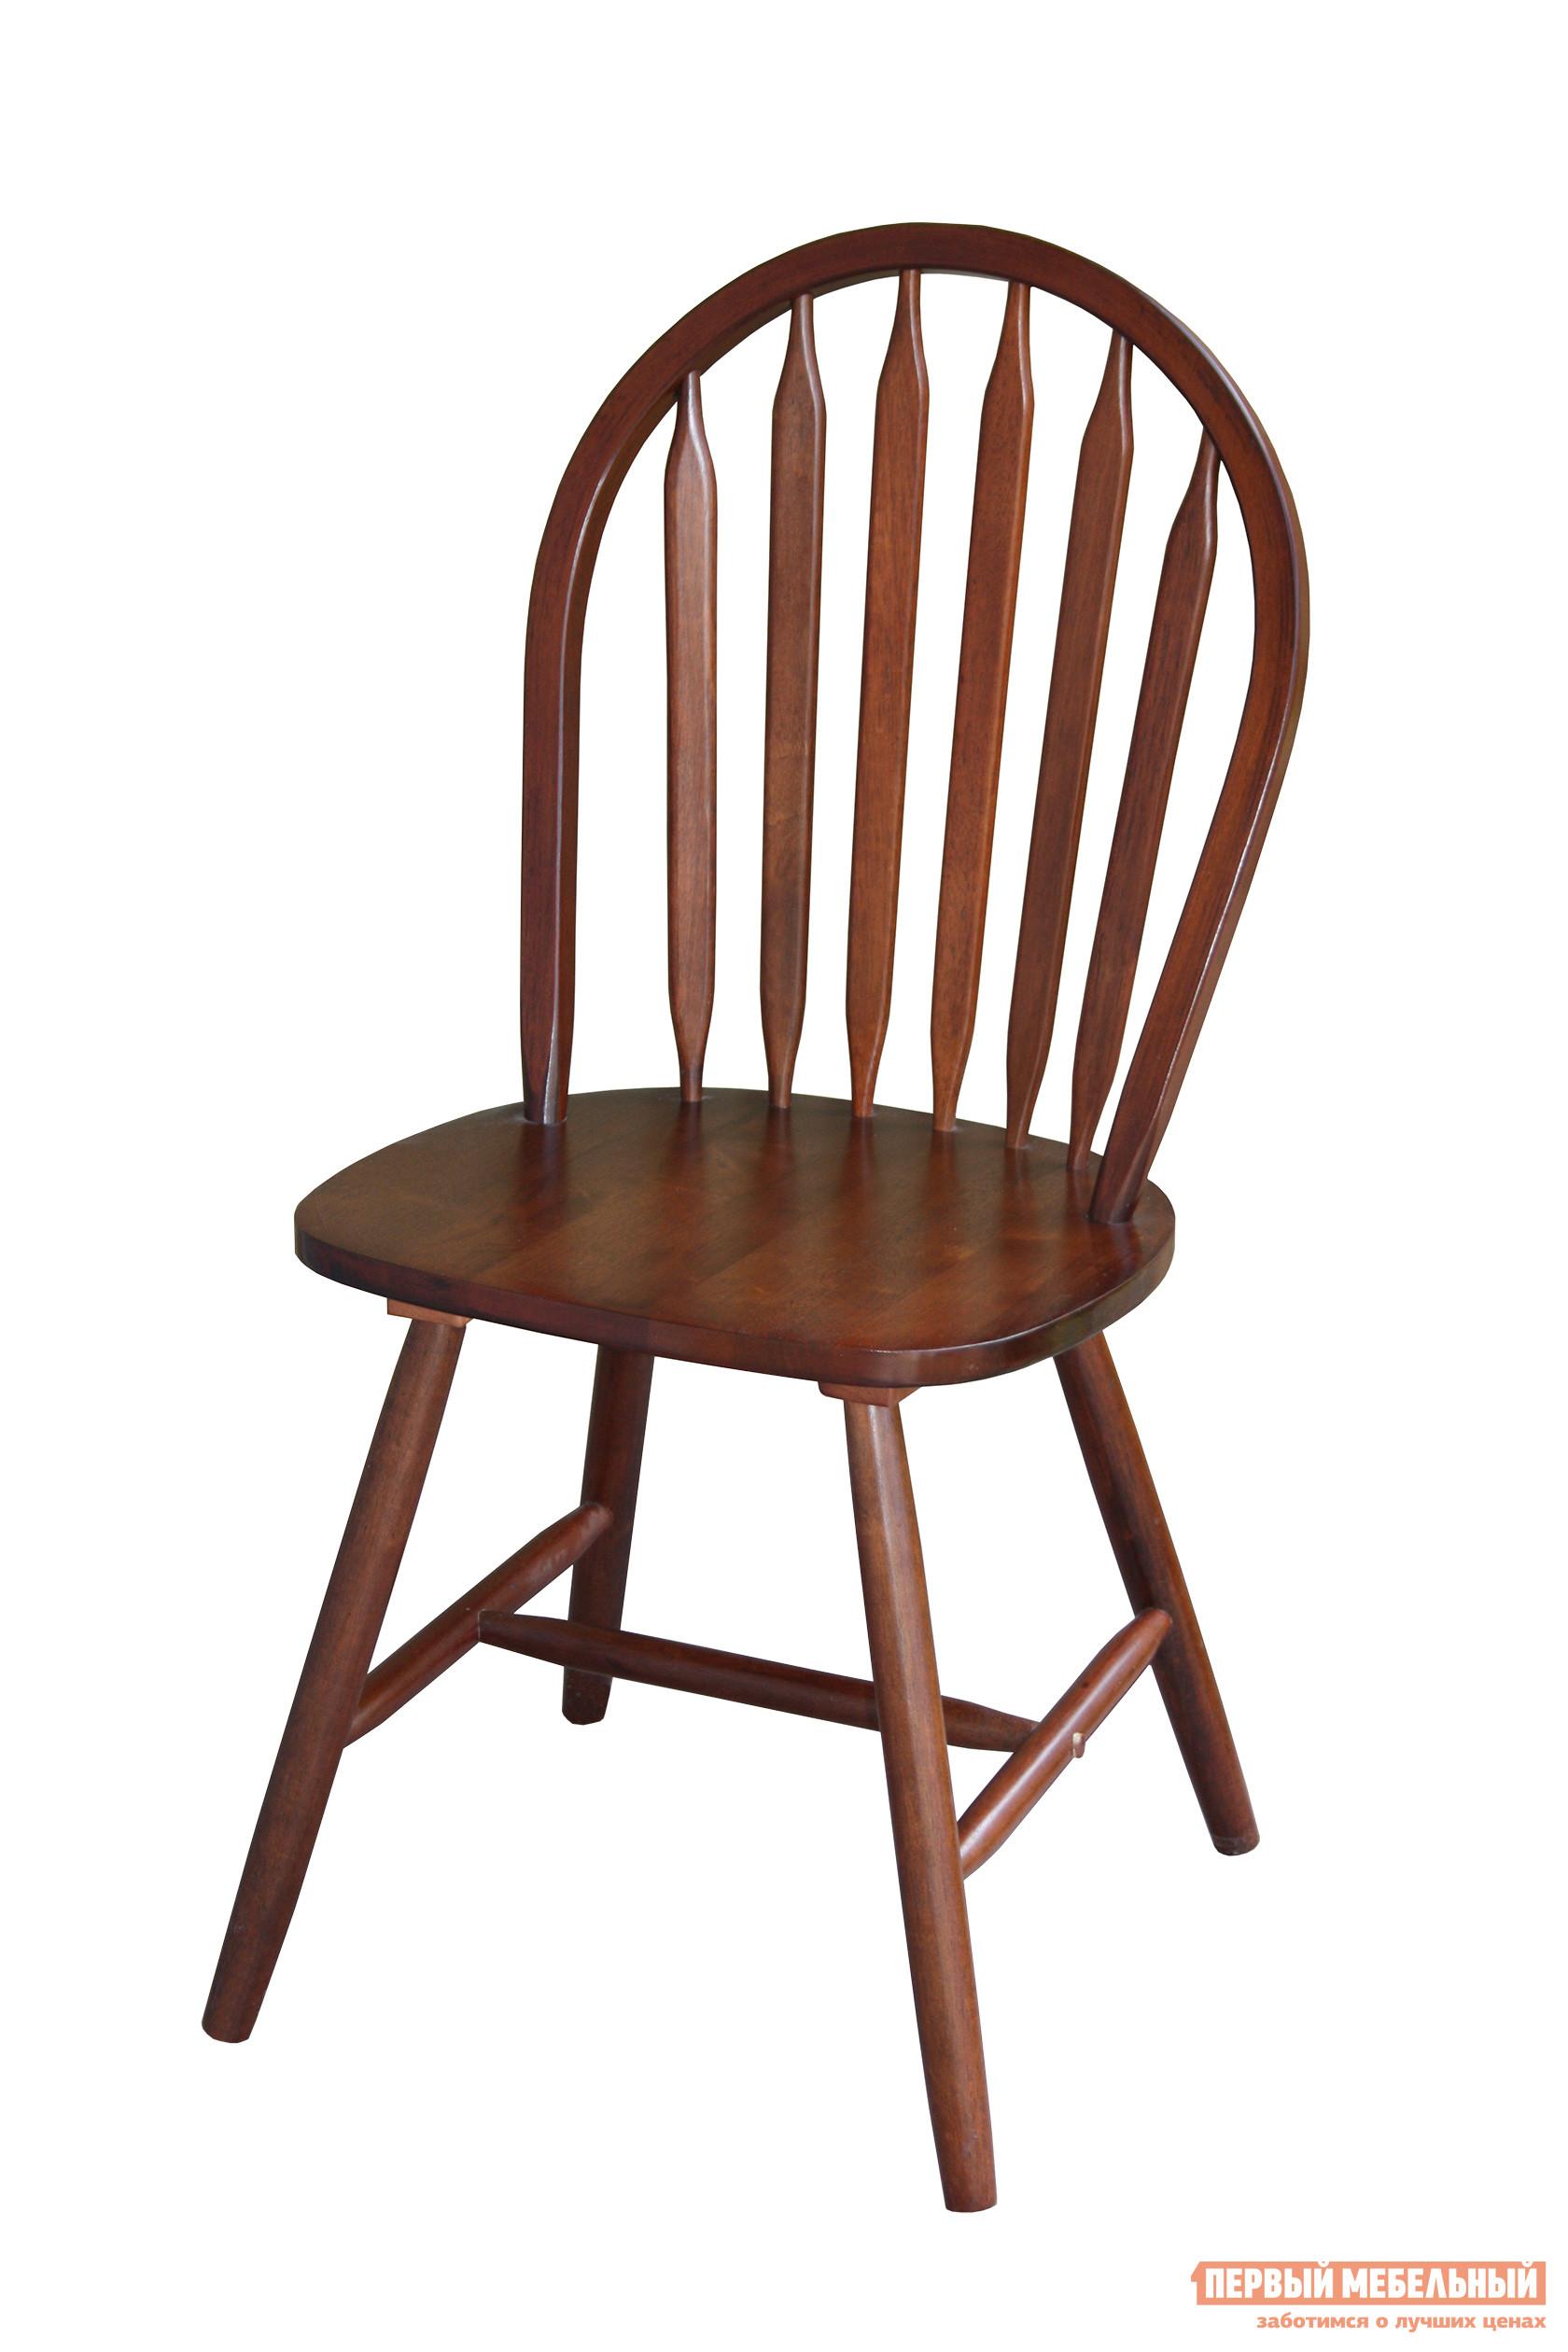 Кухонный стул Red and Black Винзор 000405 Махагон от Купистол